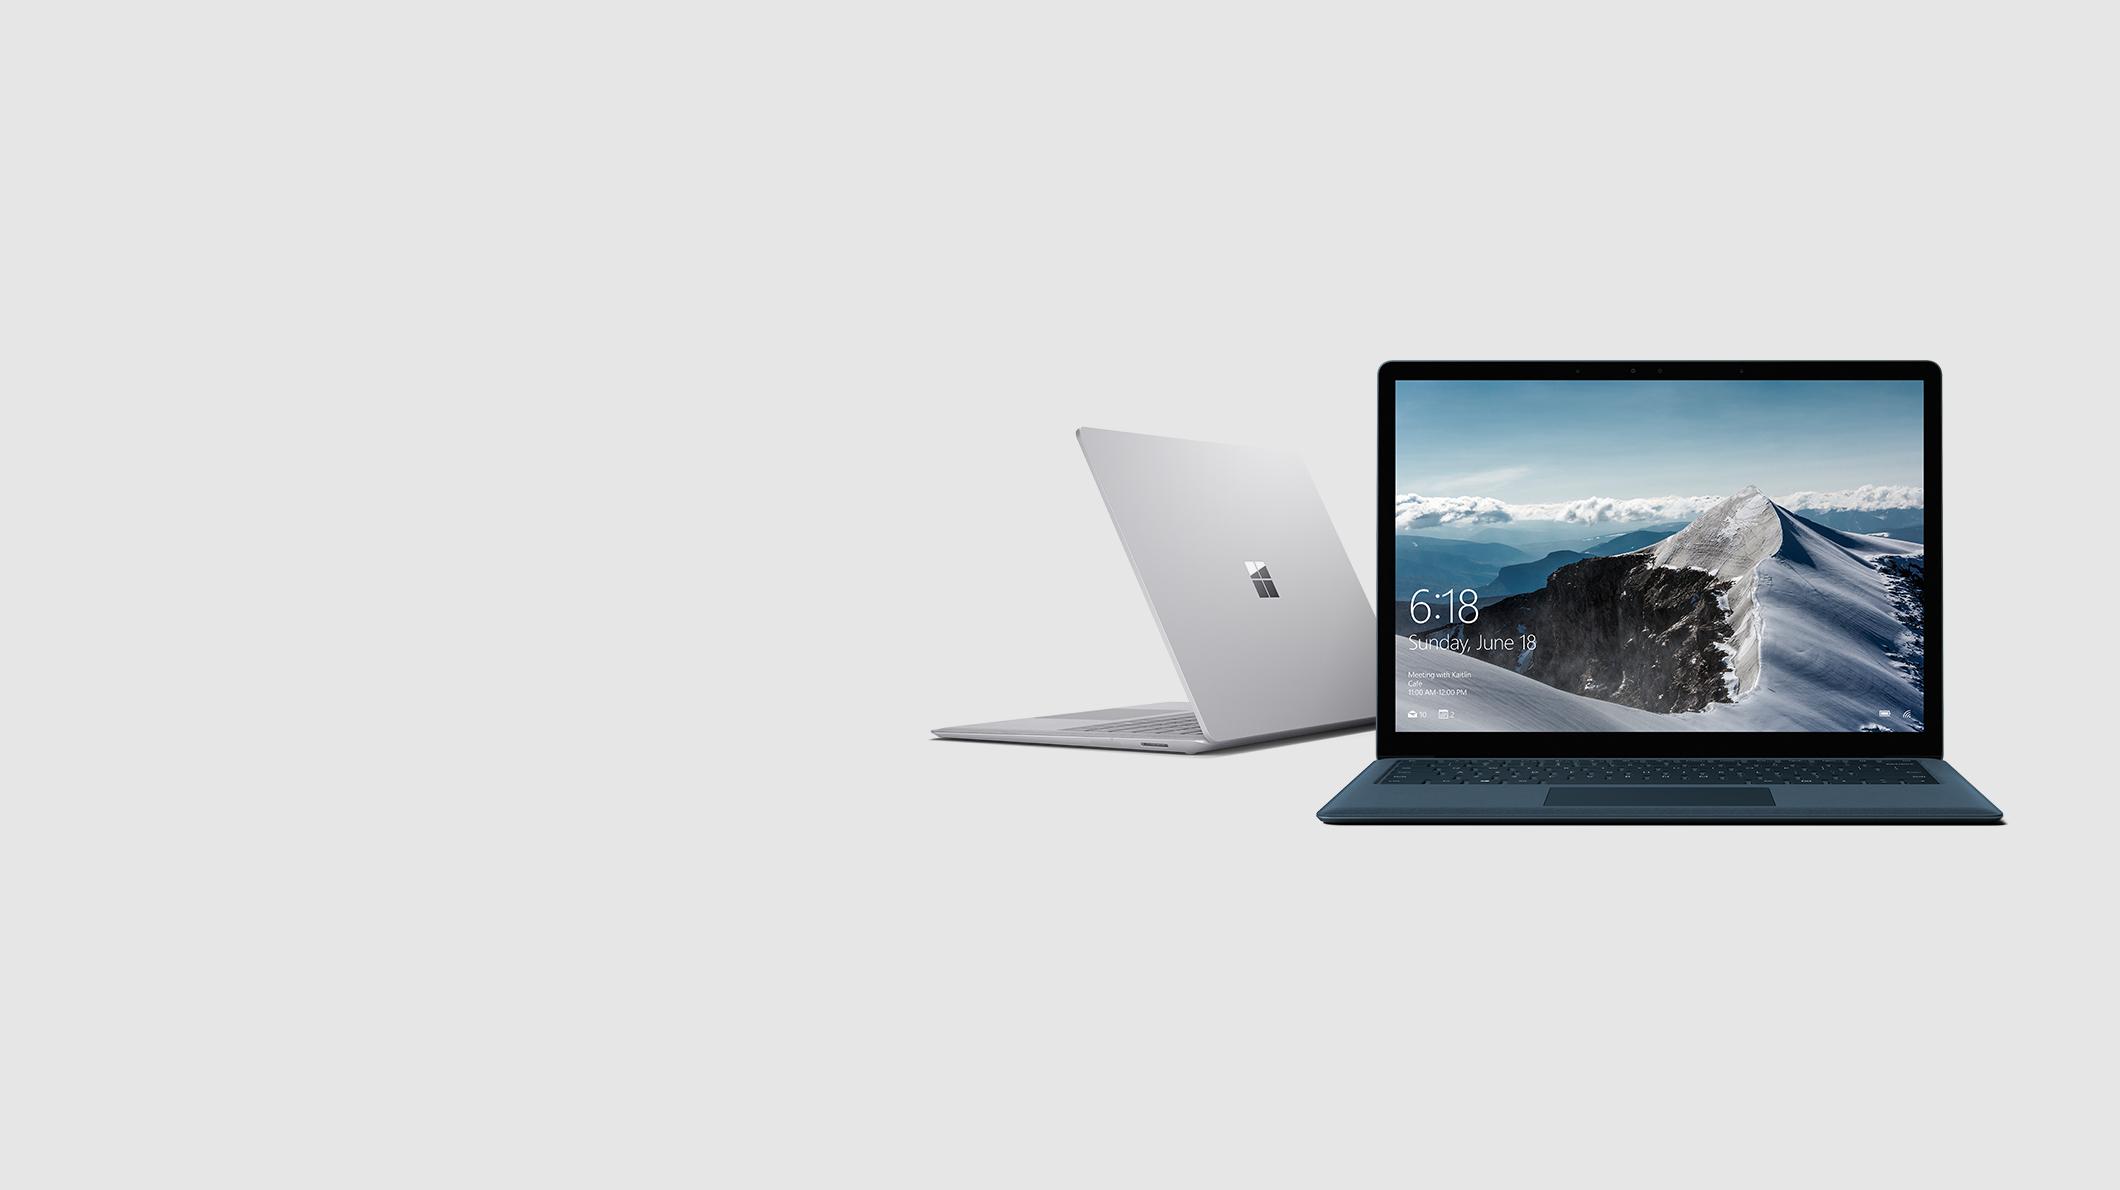 A cobalt Surface Laptop and a platinum Surface Laptop